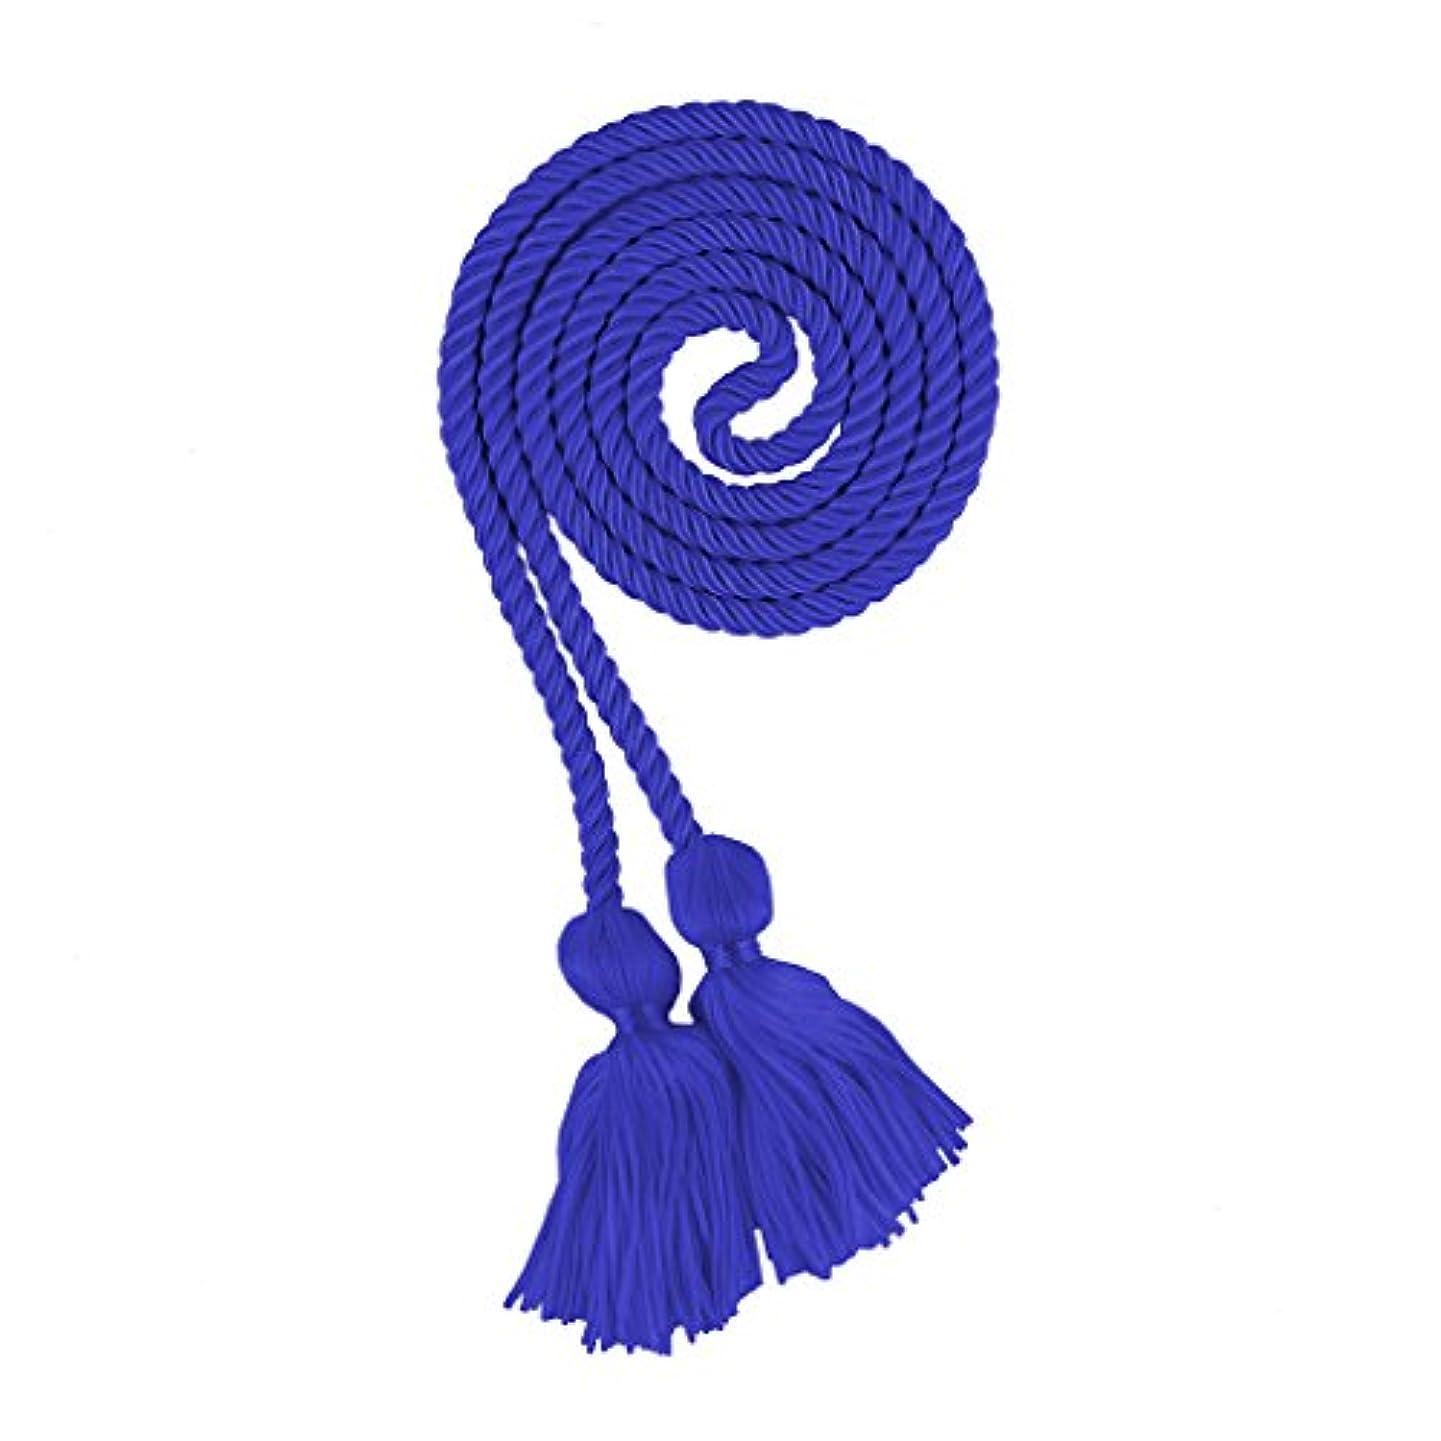 Honor Cords Academic Apparel (Royal Blue)